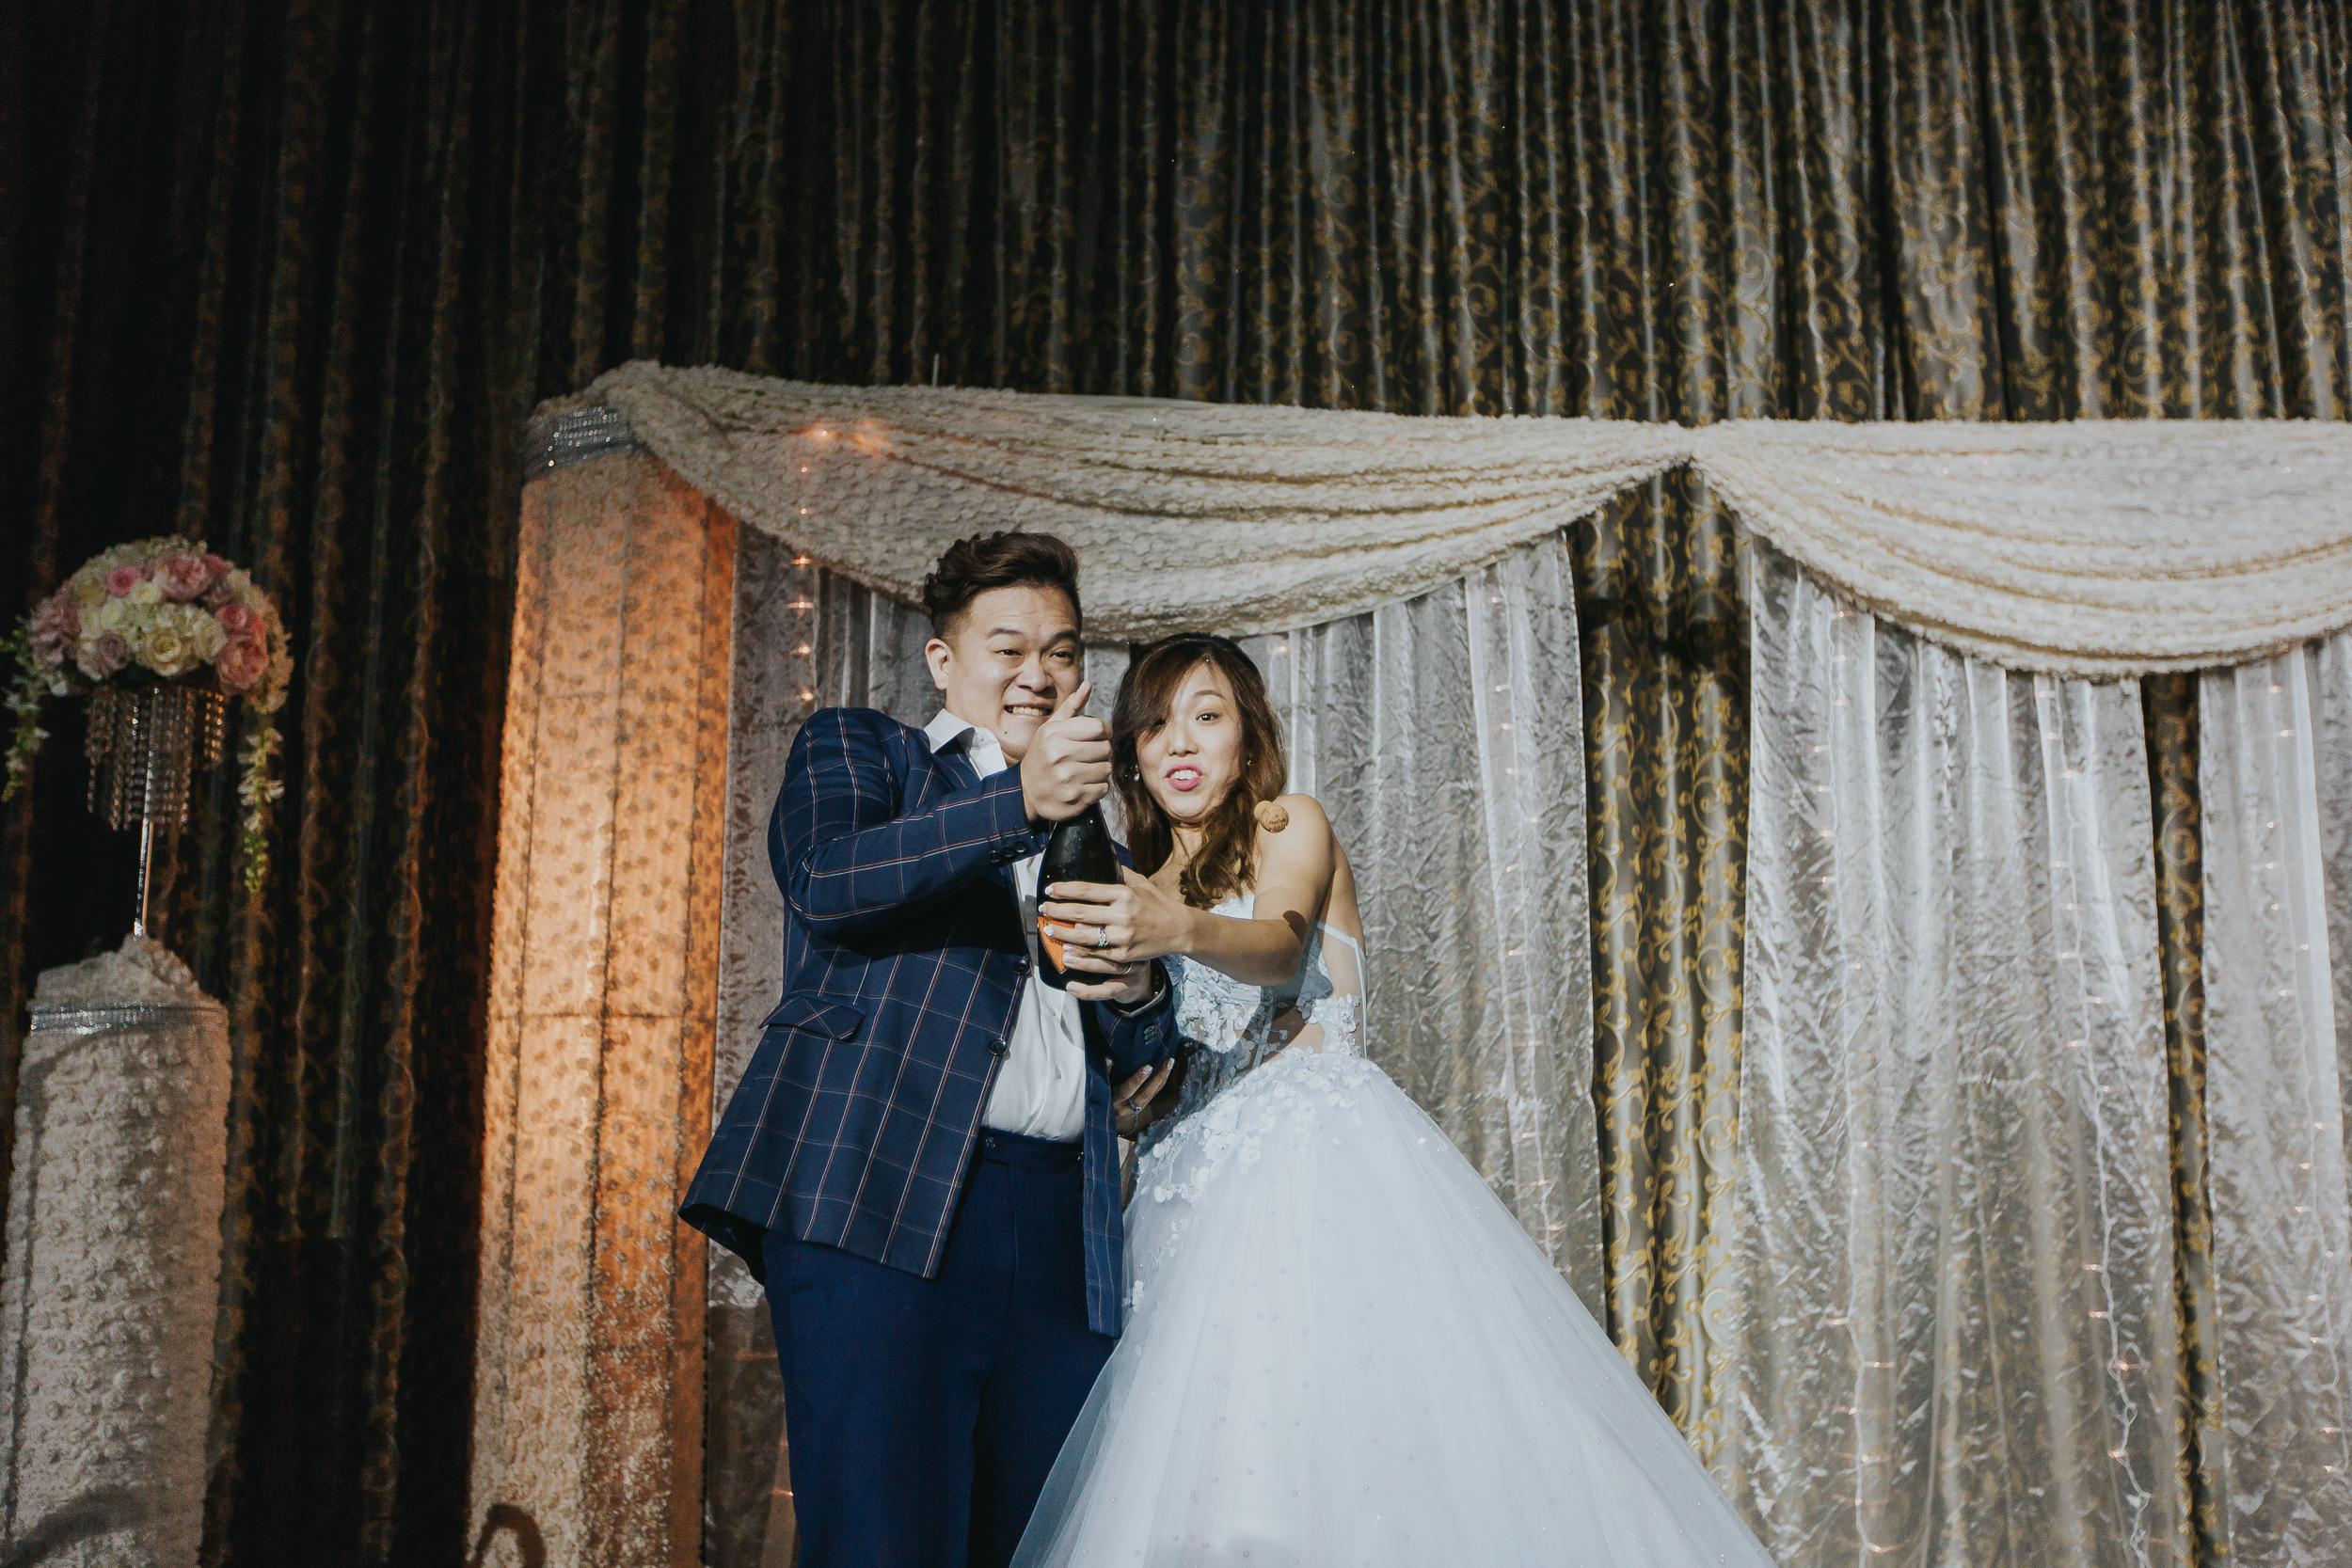 Singapore+Actual+Day+Wedding+Photographer+Grand+Mercure+Oliver+Estelle-0100.jpg